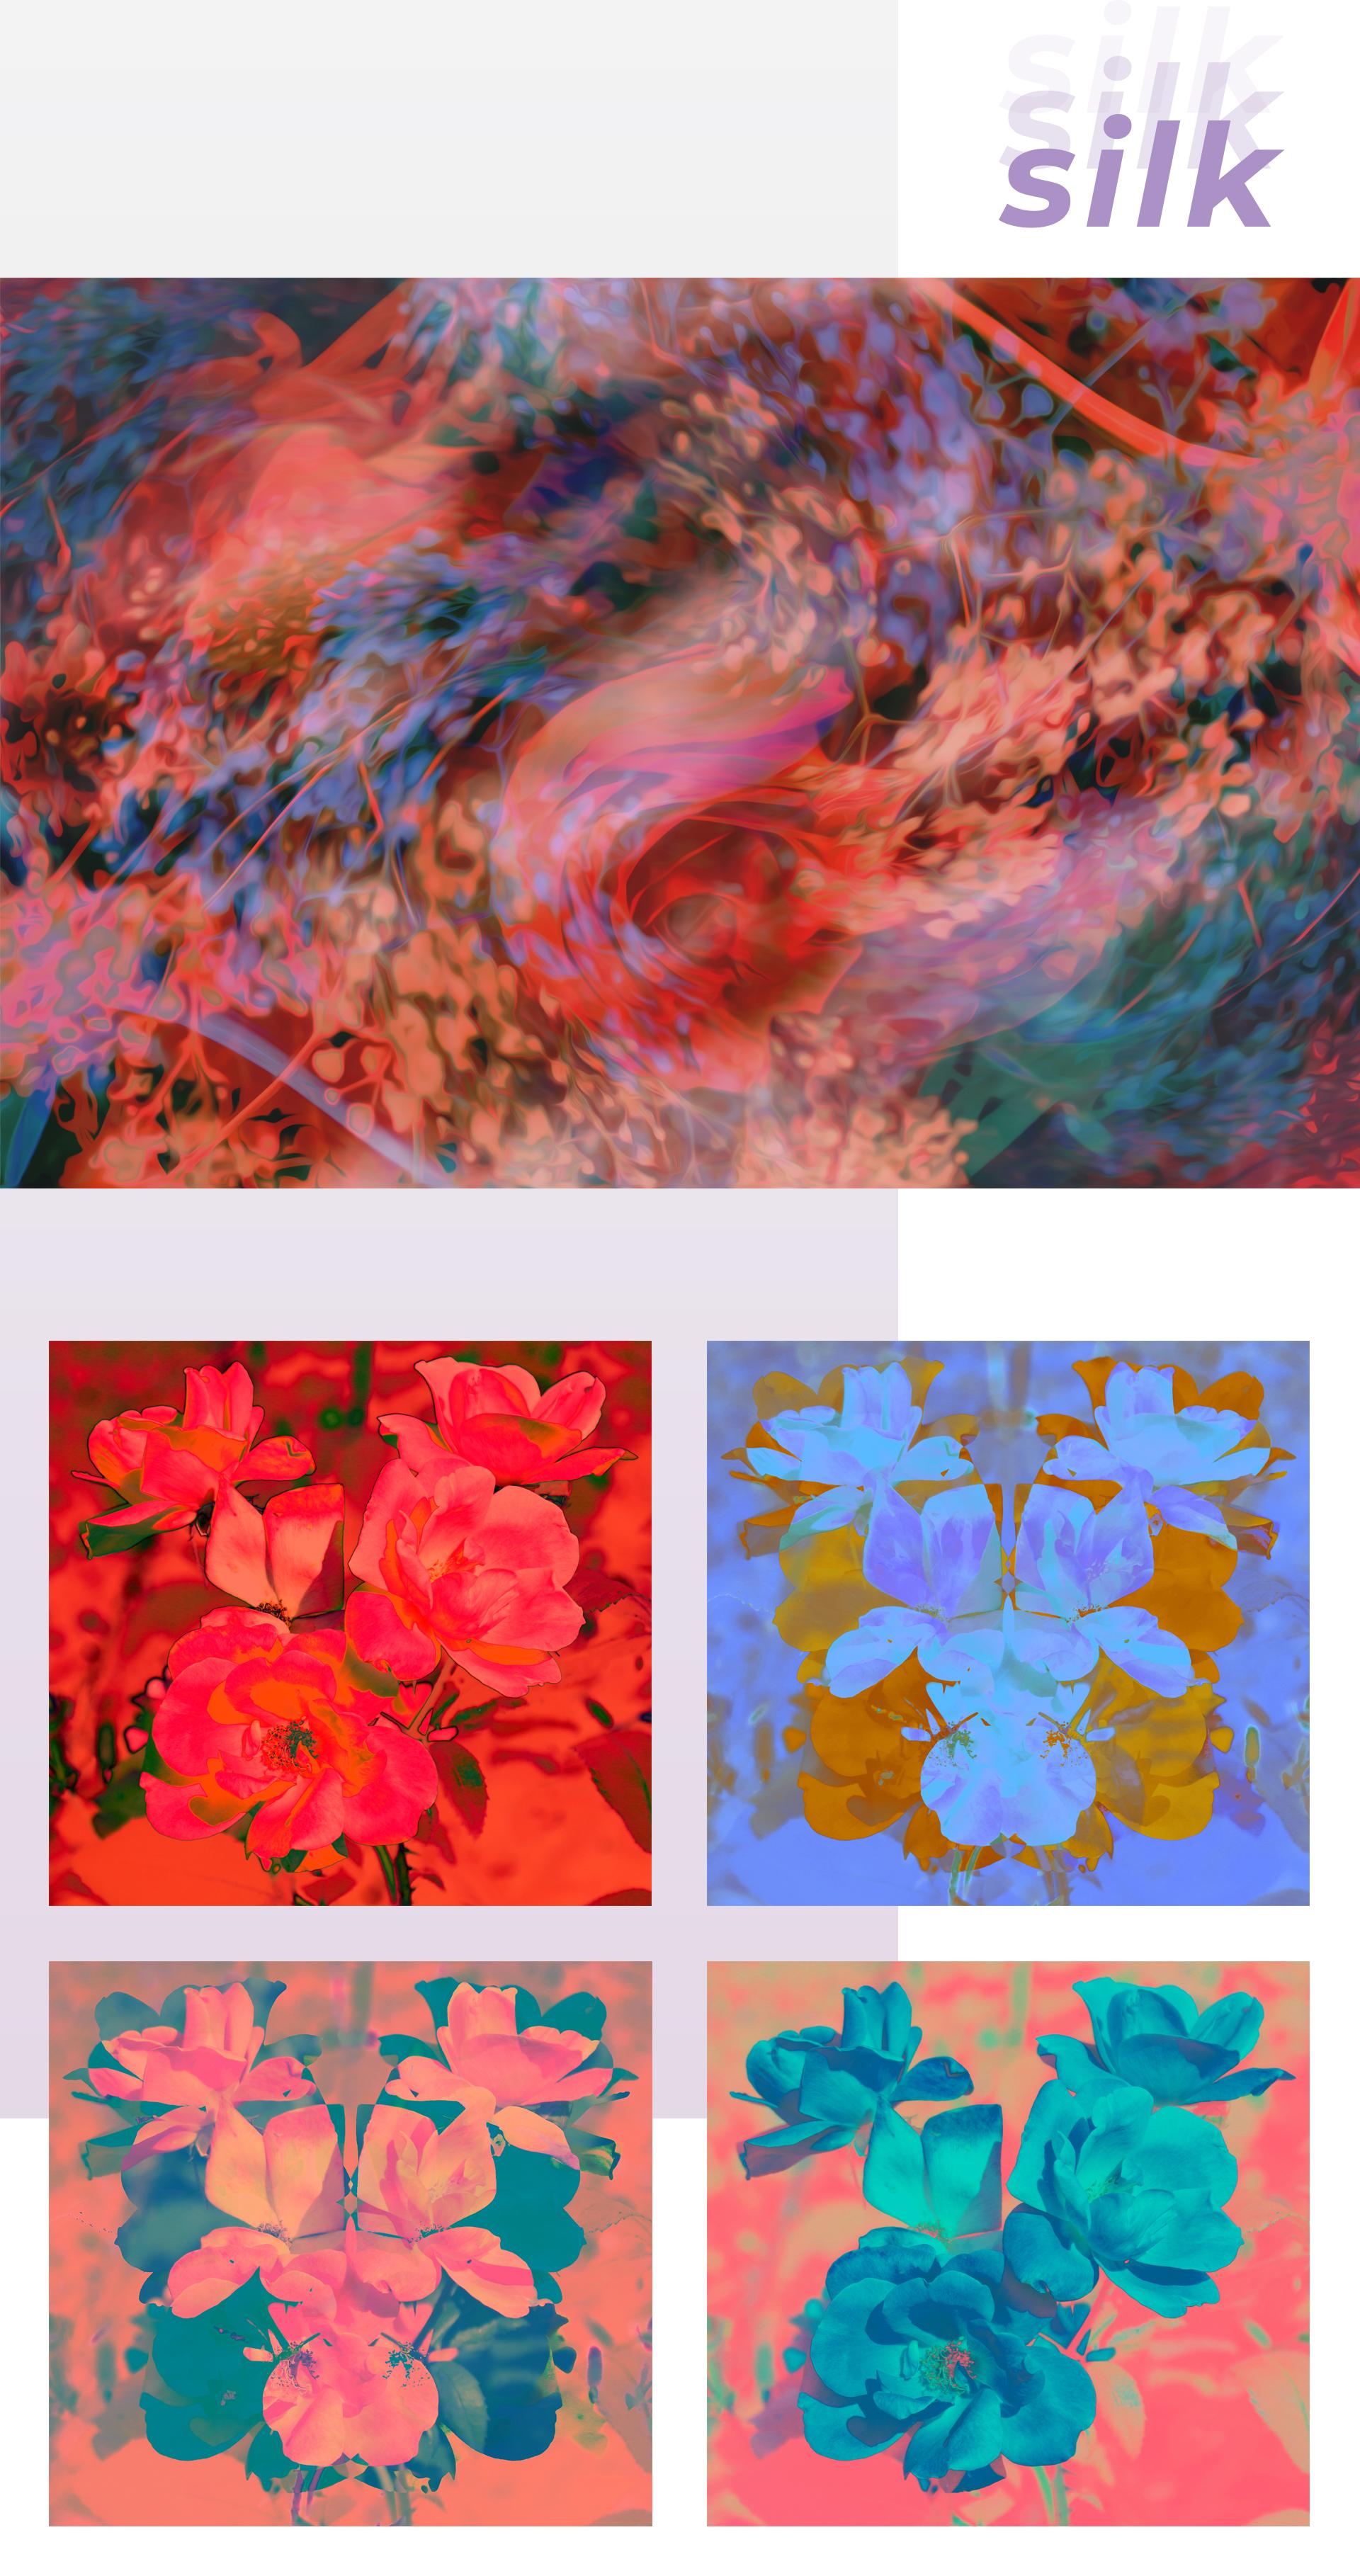 "Artwork ""Silk"" part of series of art prints ""Flower Daze"" by Geena Matuson @geenamatuson #thegirlmirage. See more @ https://thegirlmirage.com."